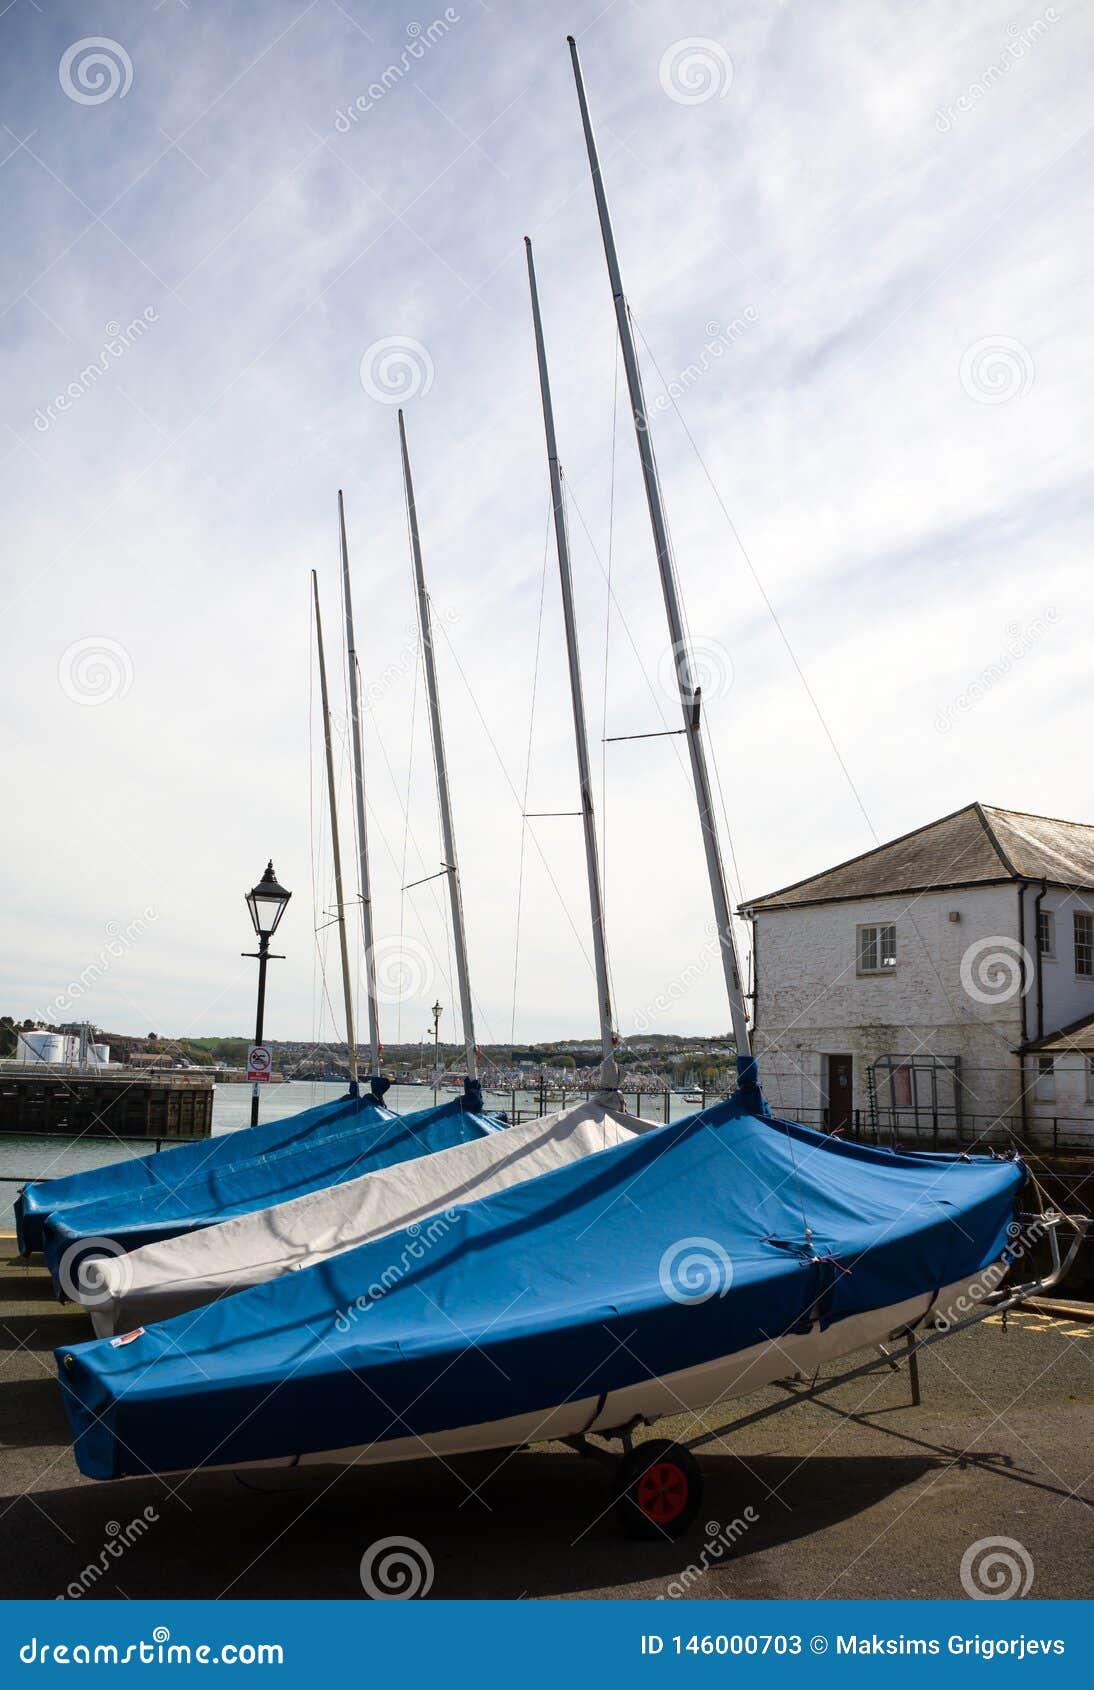 Fileira dos barcos no armazenamento sob o toldo, armazém no cais do barco, Plymouth, Devon, Reino Unido, o 23 de maio de 2018